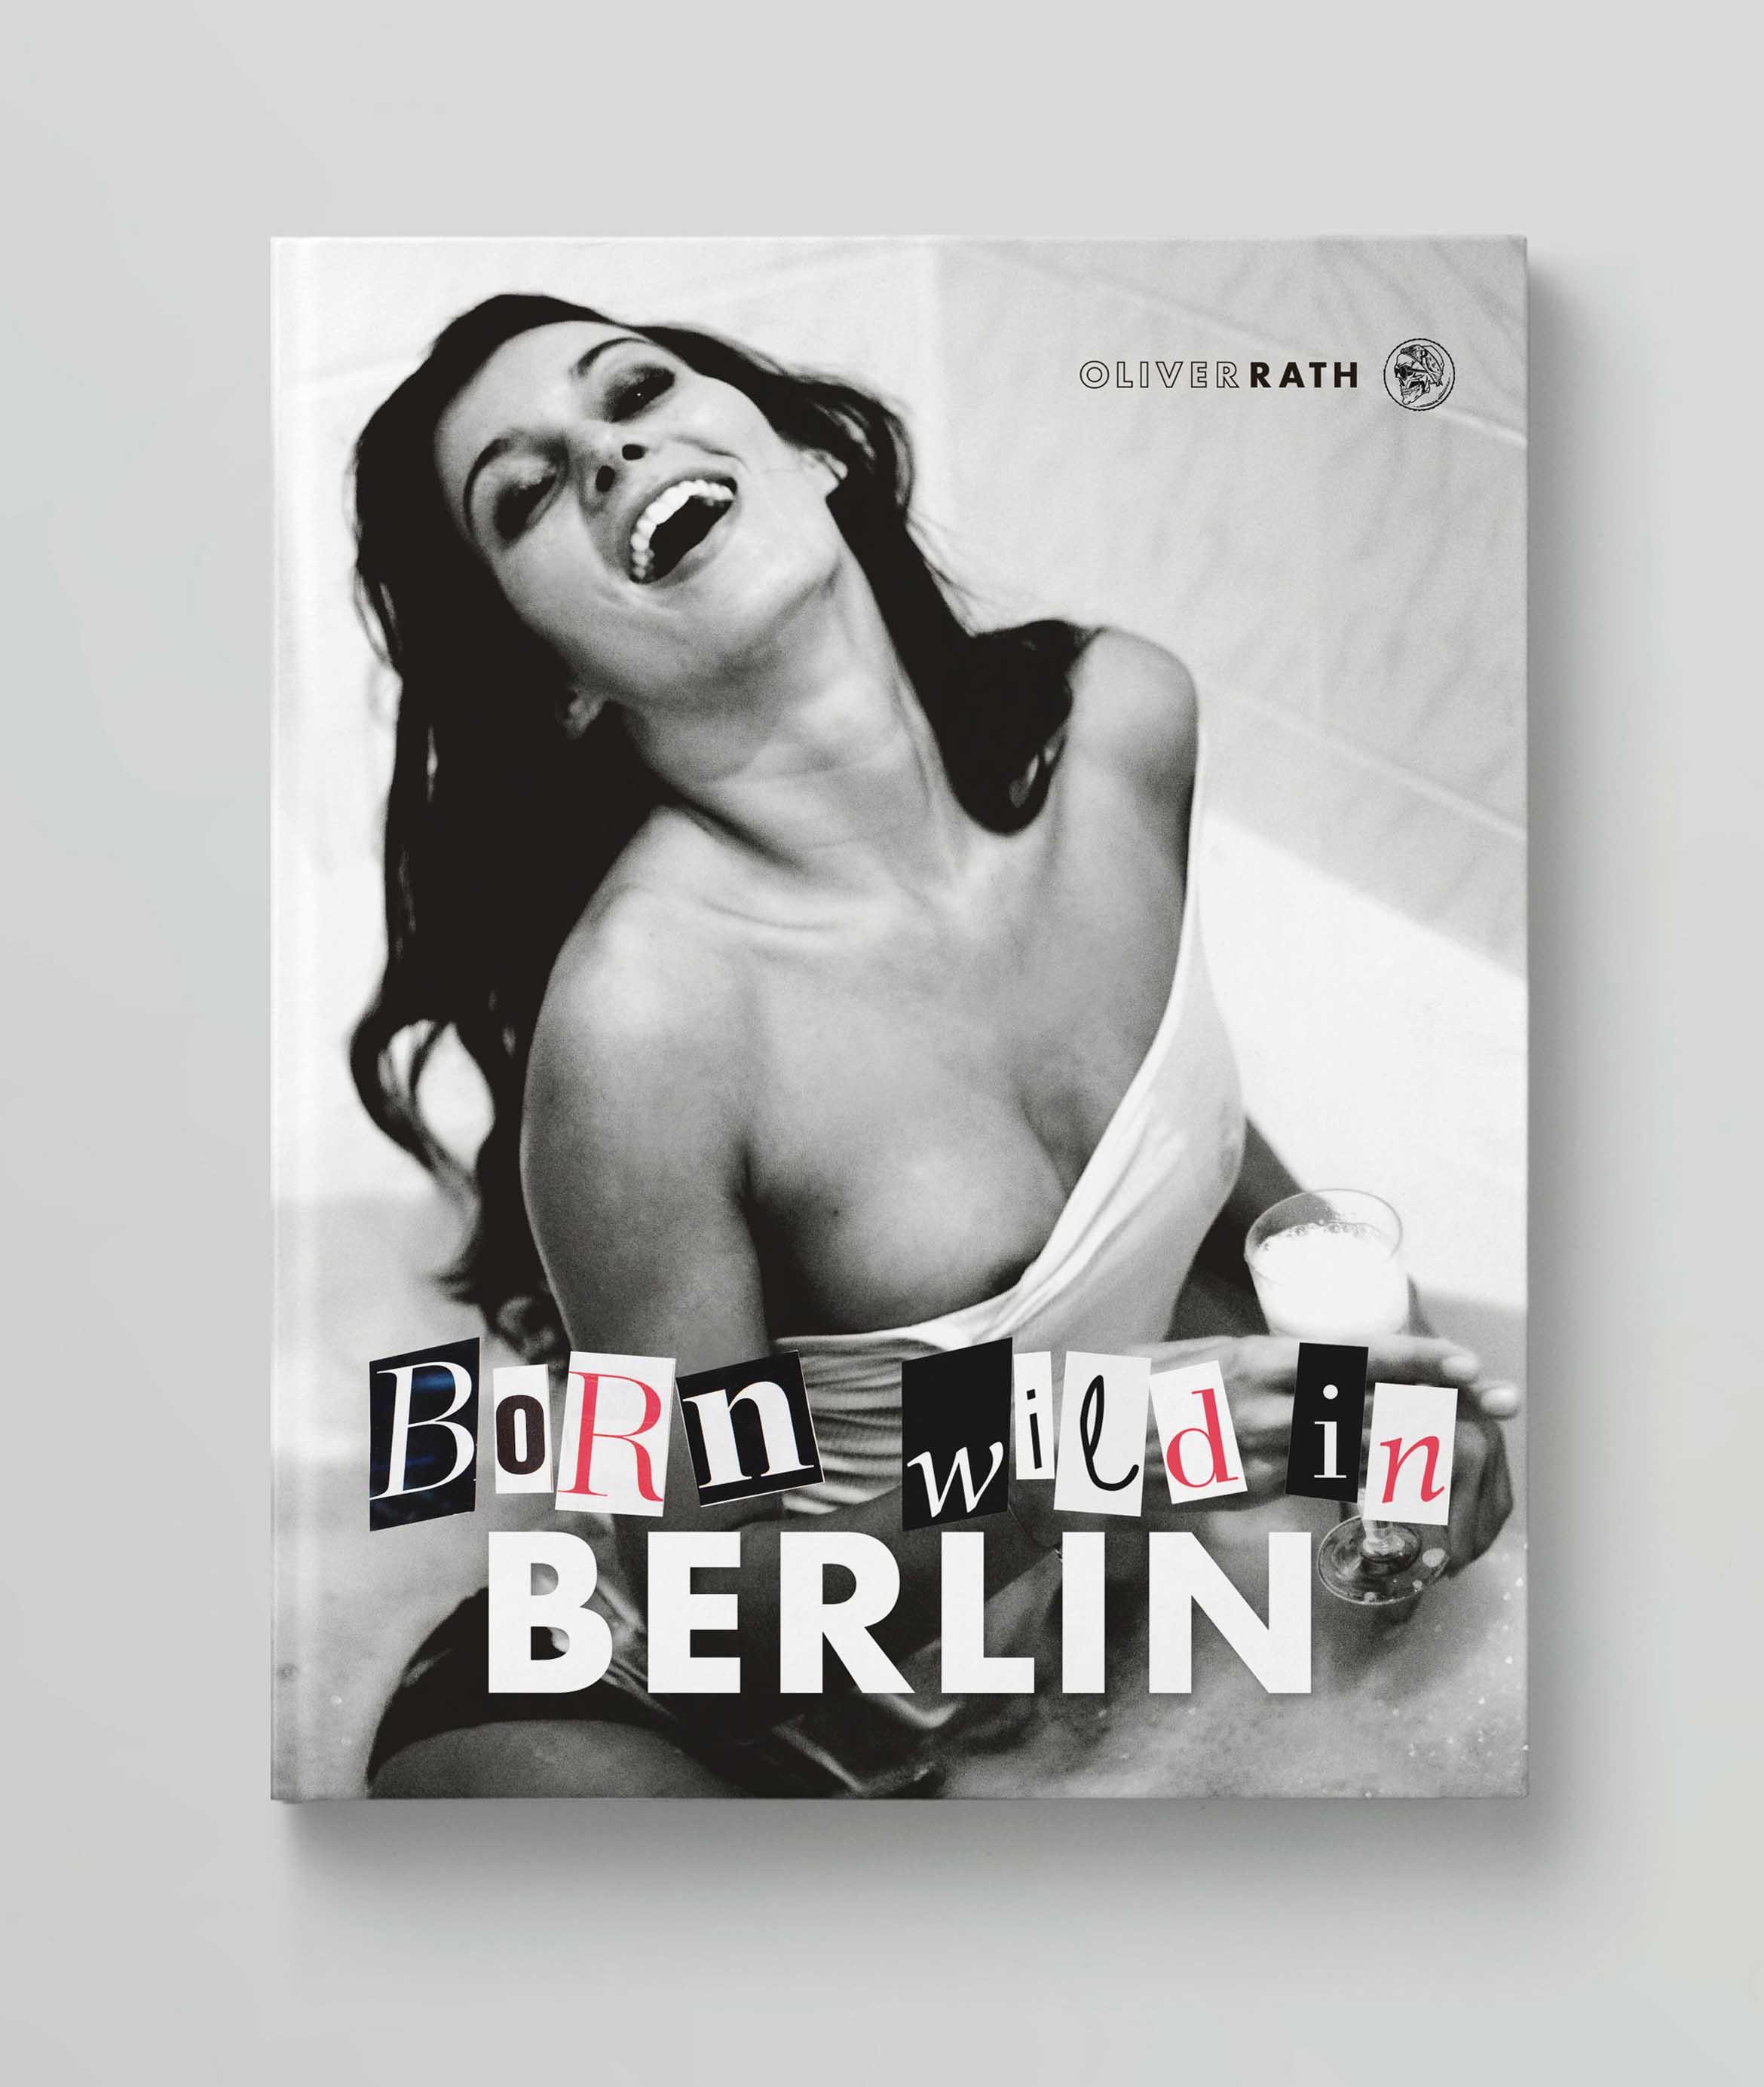 oliver_rath_born_wild_cover_01